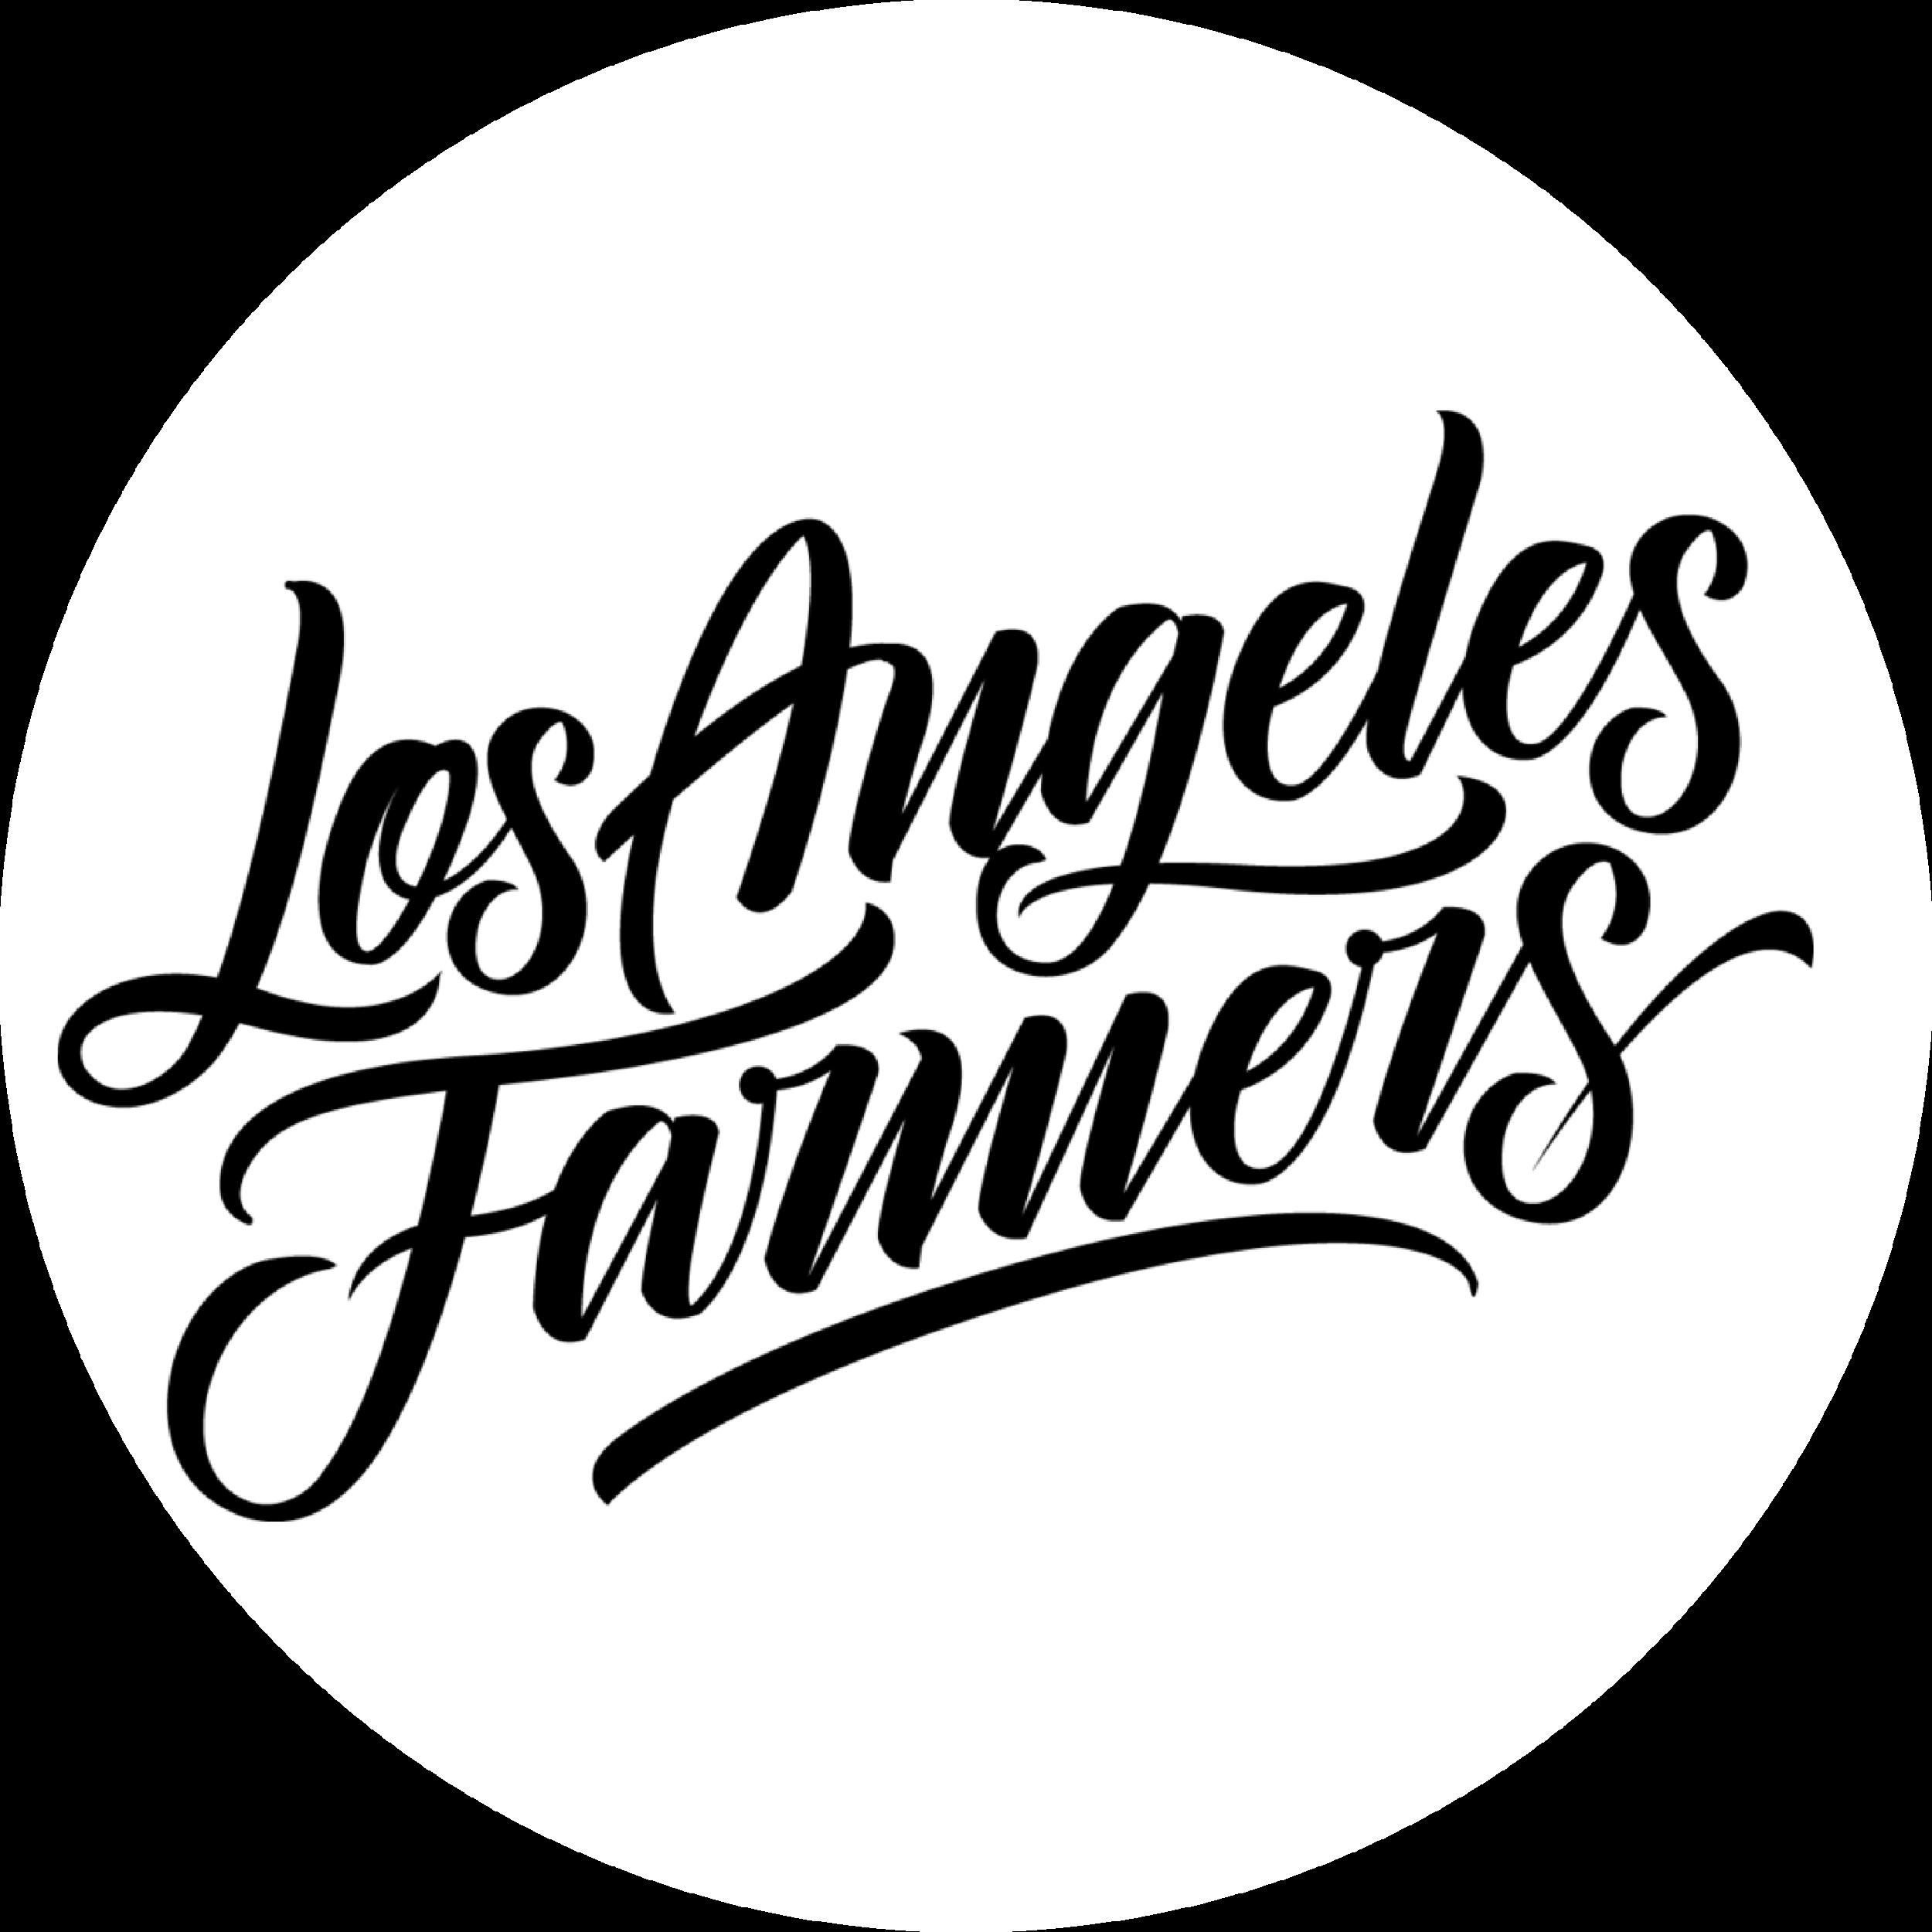 los angeles farmers (AHPS) - 824 East 17th Street90021213.973.5209thelosangelesfarmers.com